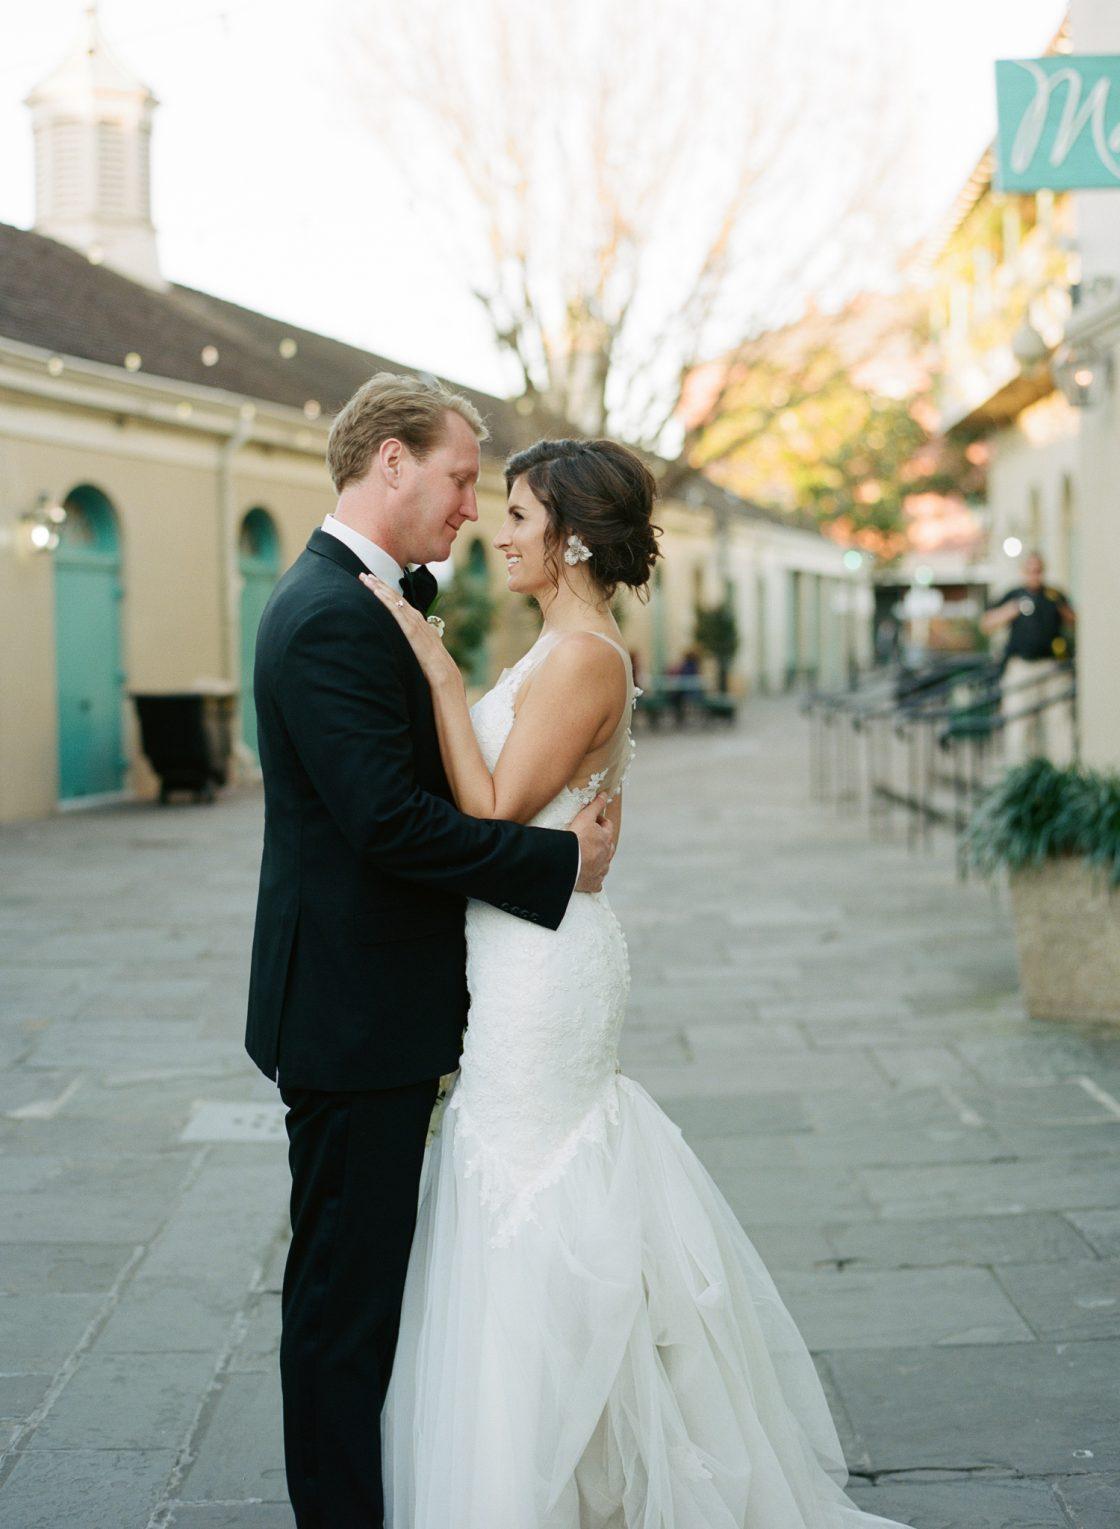 Southern Wedding Portrait